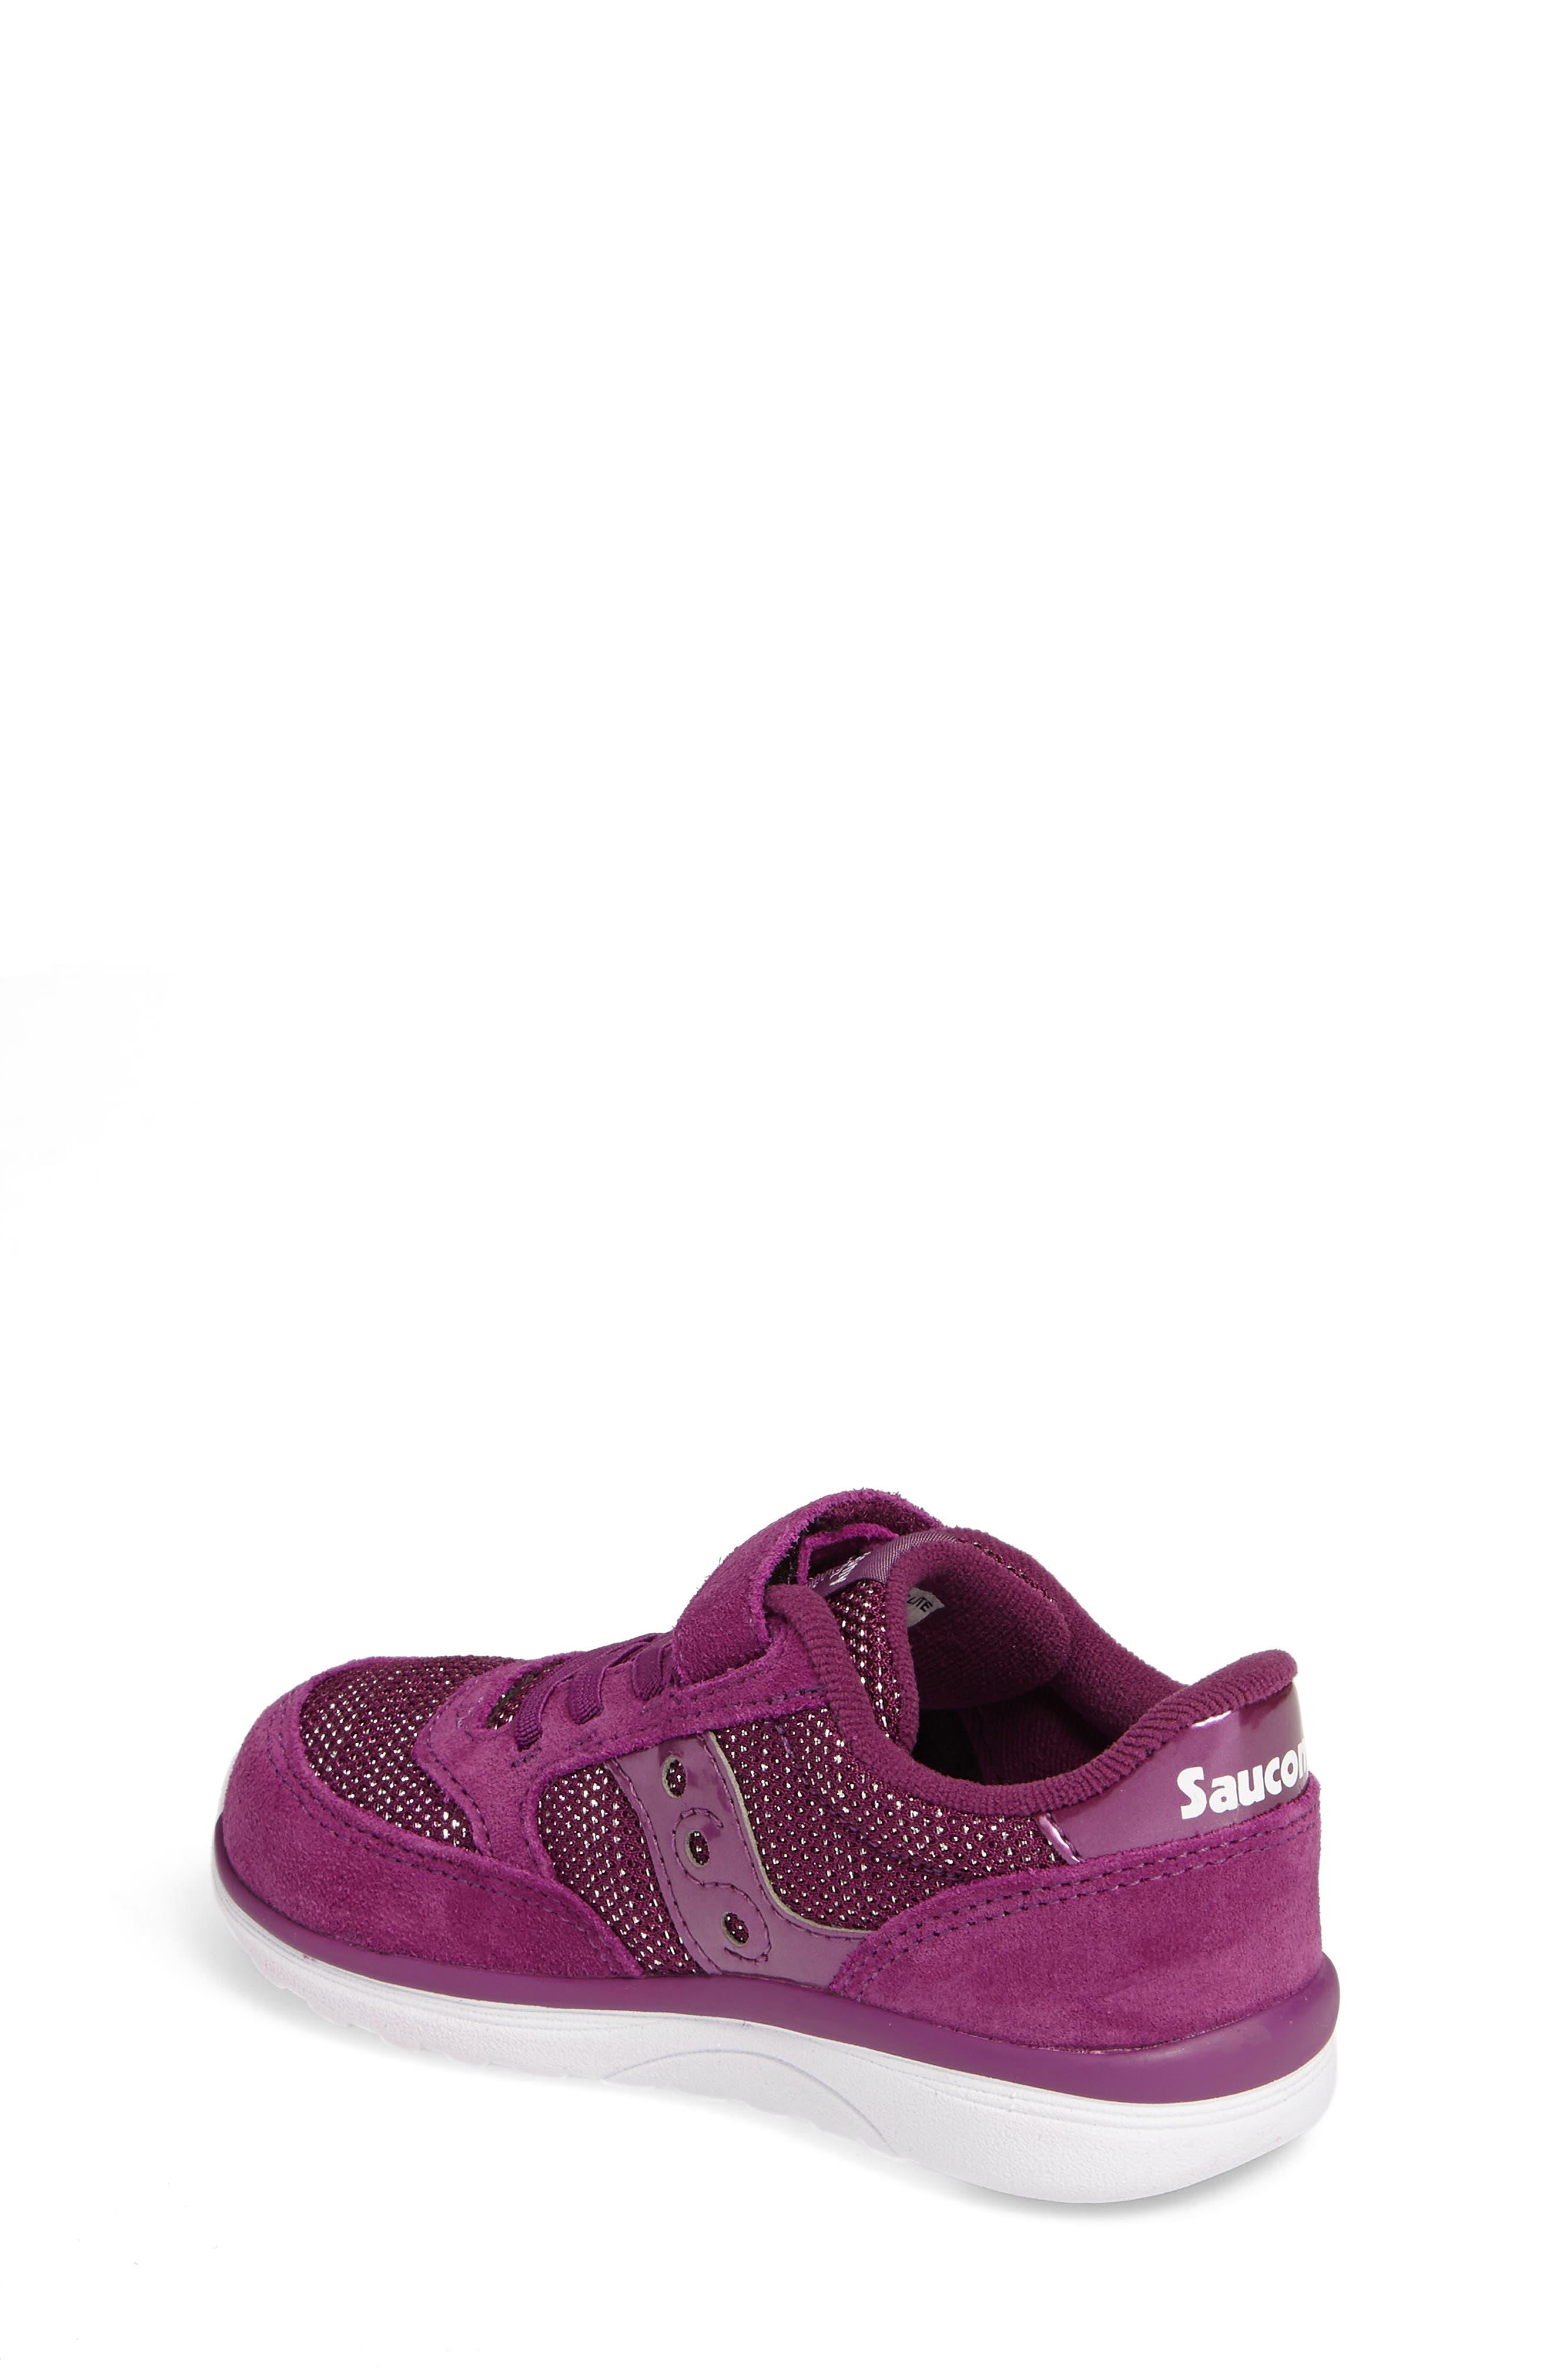 Alternate Image 2  - Saucony Jazz Lite Sneaker (Baby, Toddler & Walker)